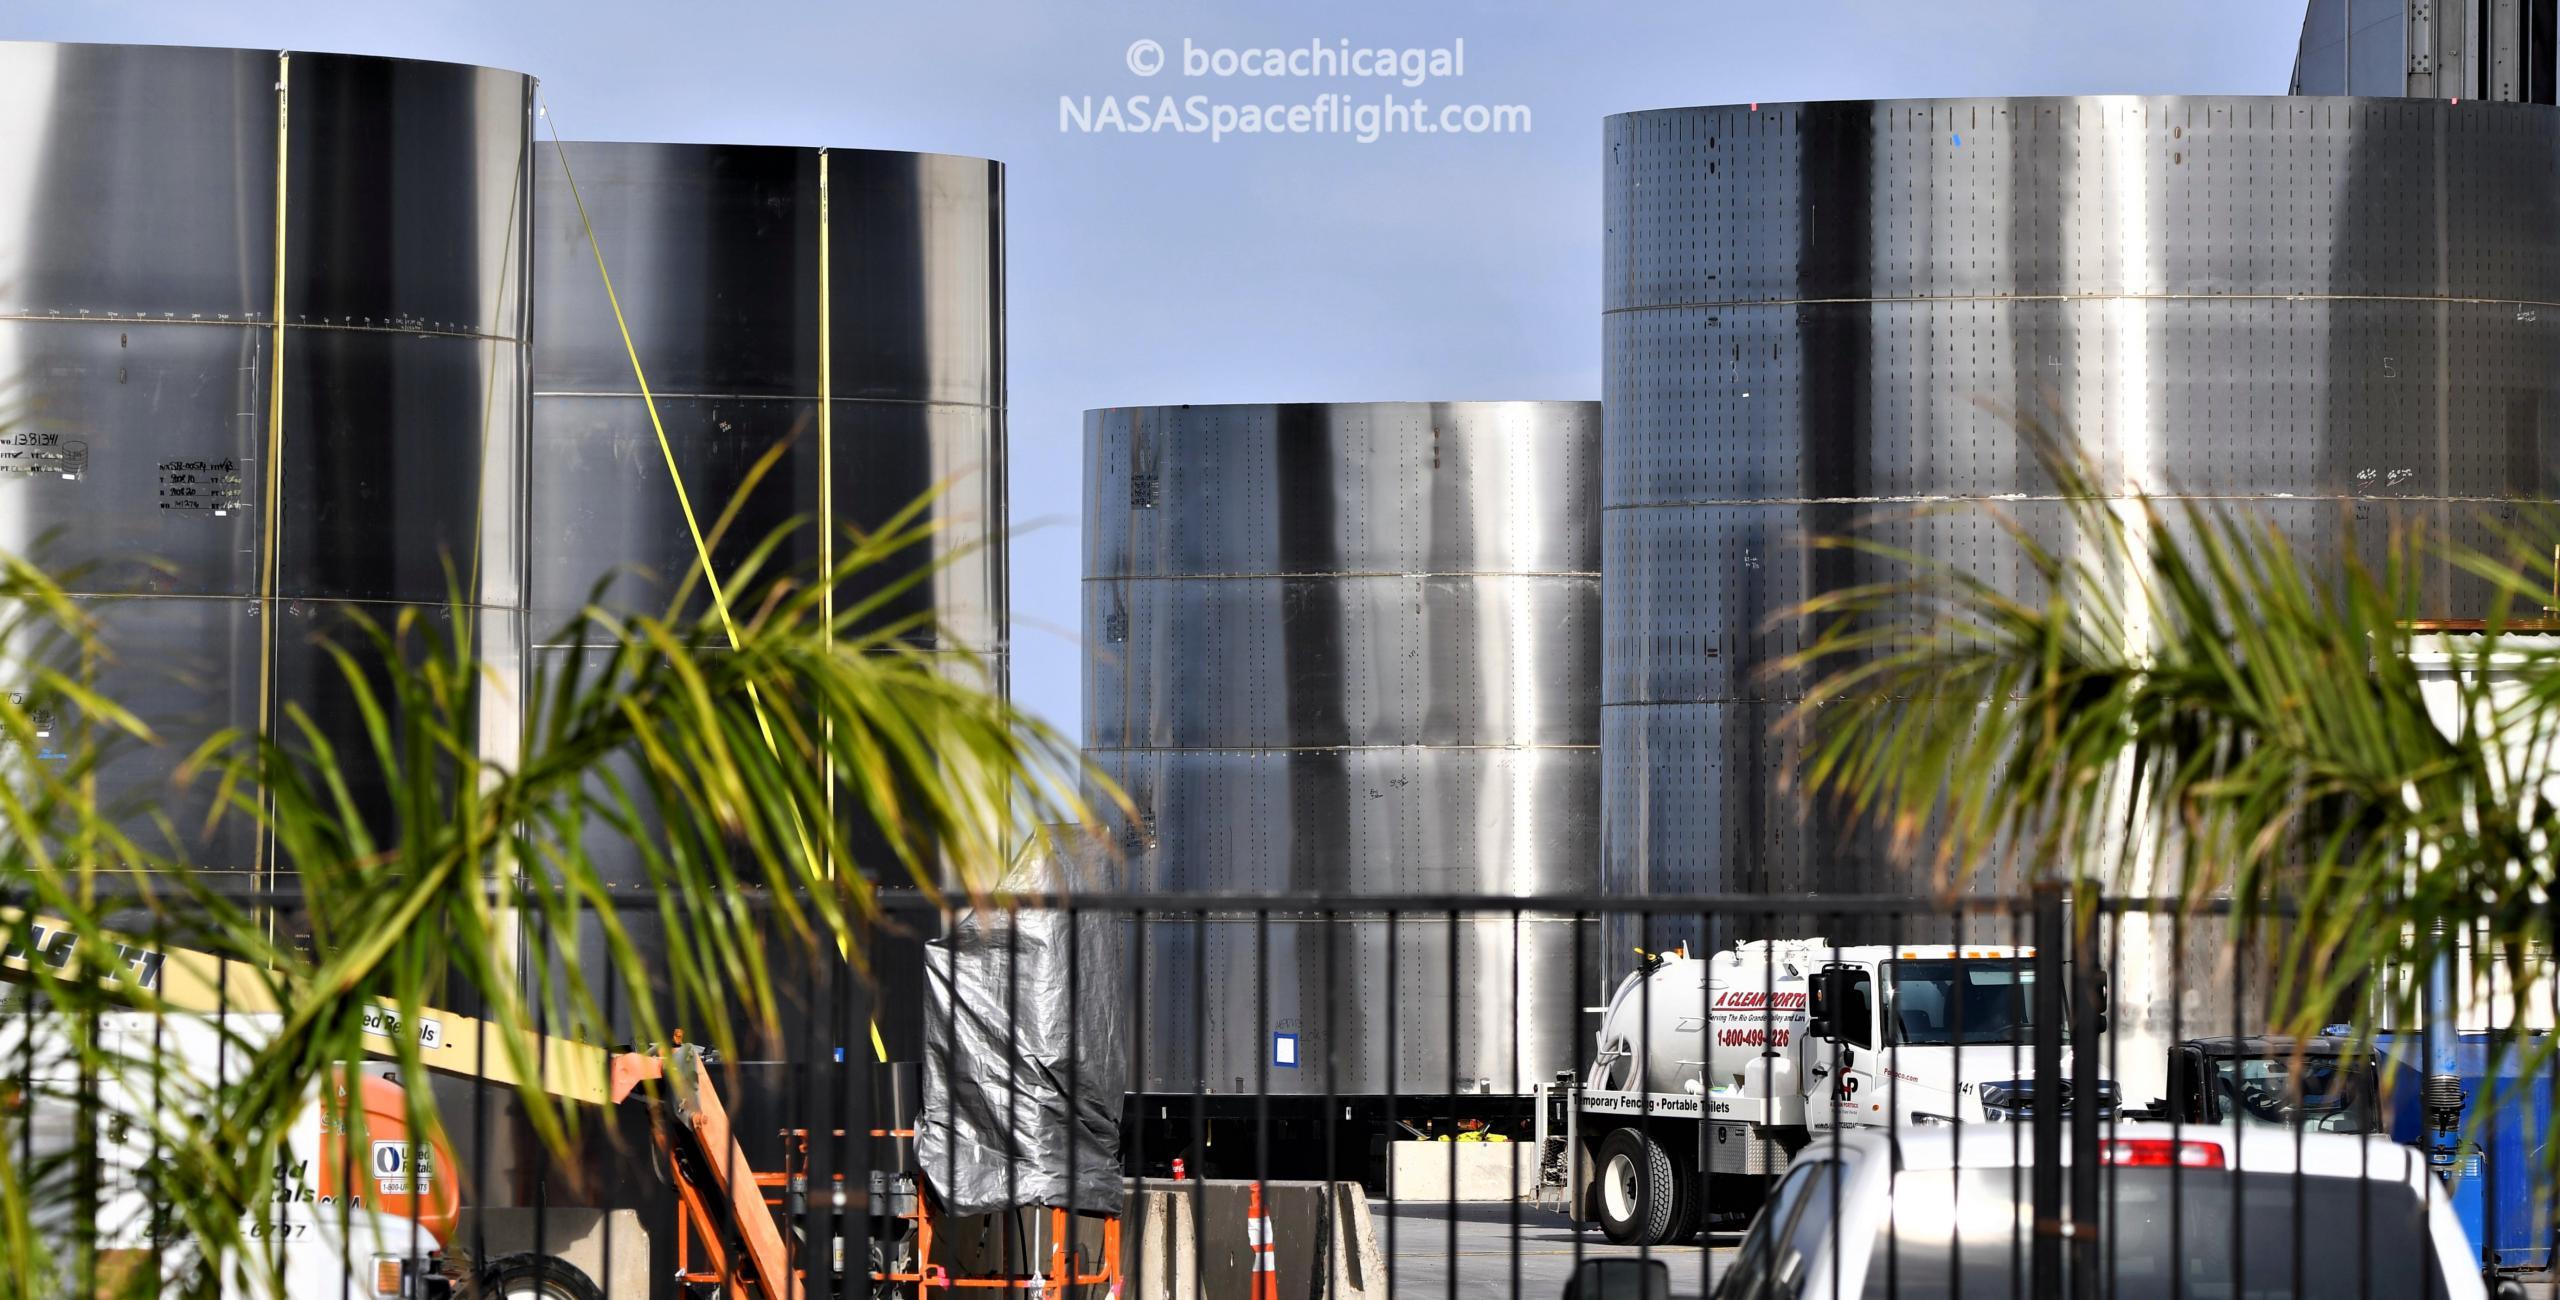 Starship Boca Chica 110720 (NASASpaceflight – bocachicagal) SH1 rings 1 crop (c)